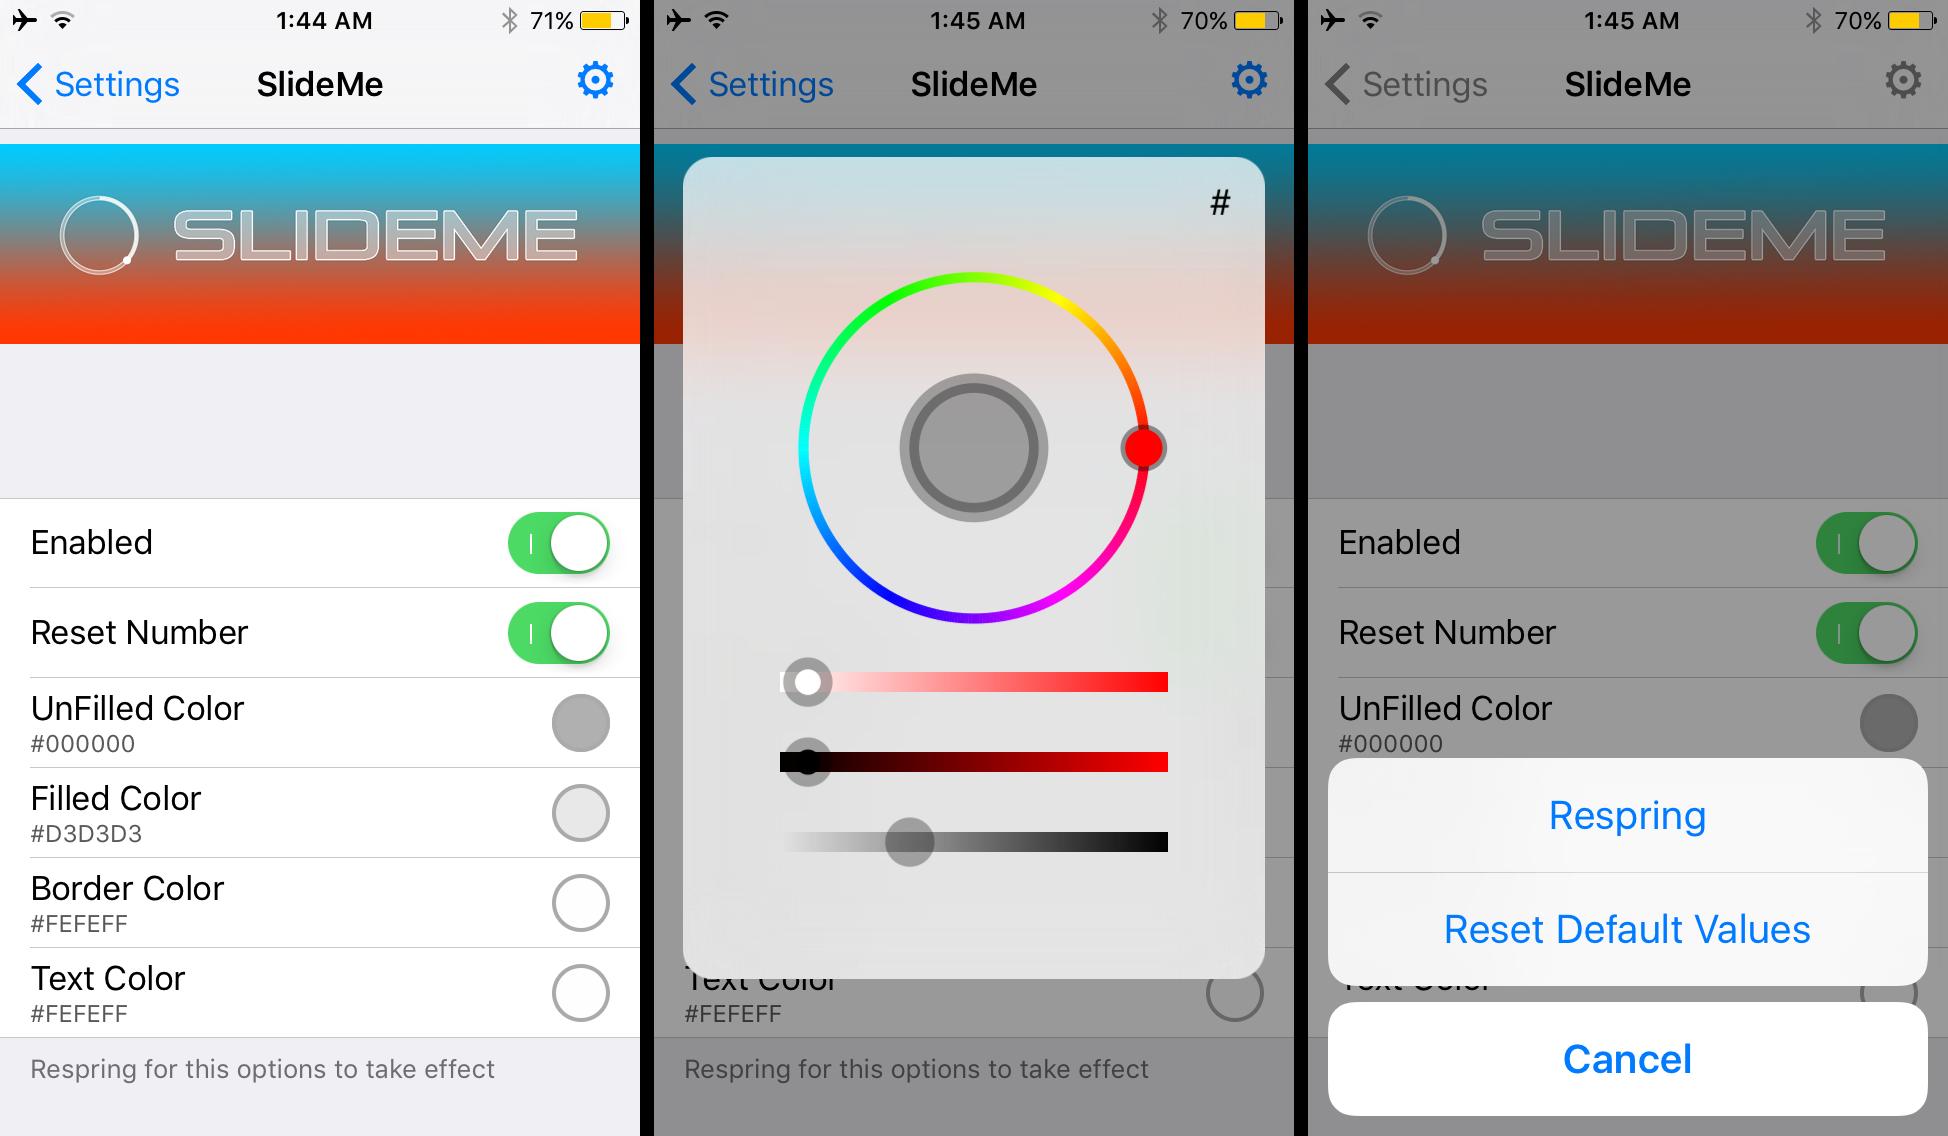 SlideMe Preferences Pane Options to Configure